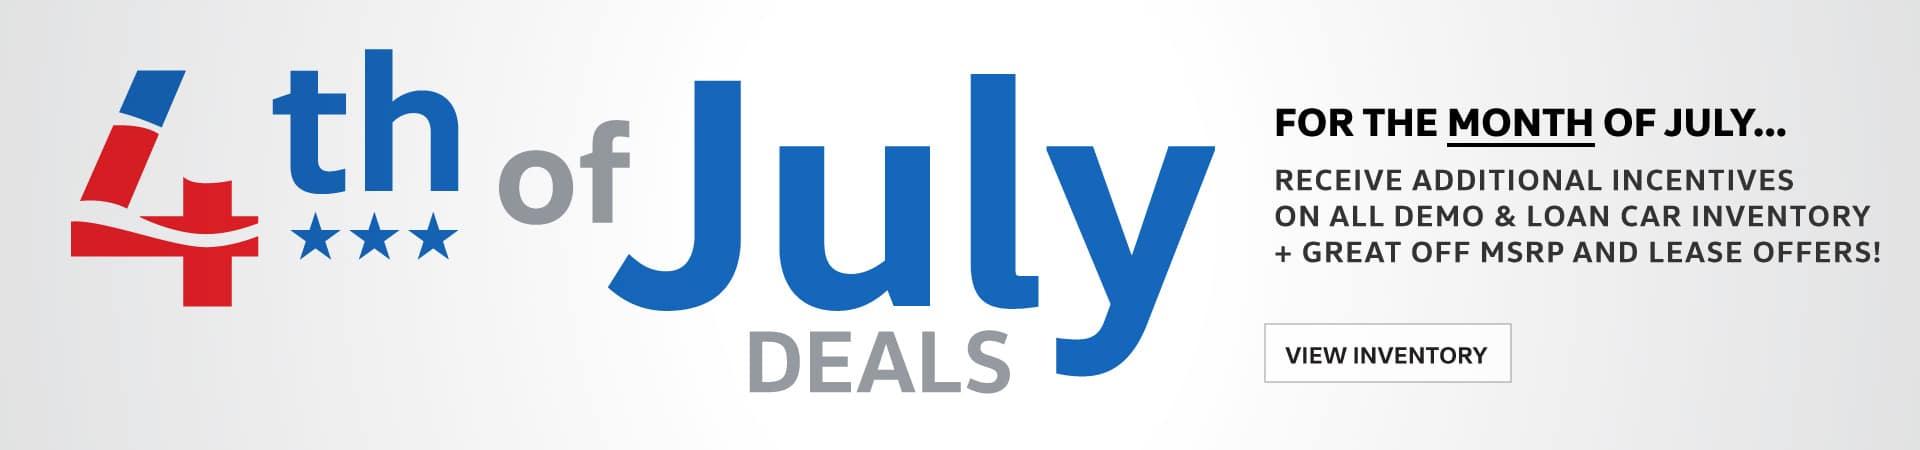 Autobahn Volkswagen | JULY Sales Specials